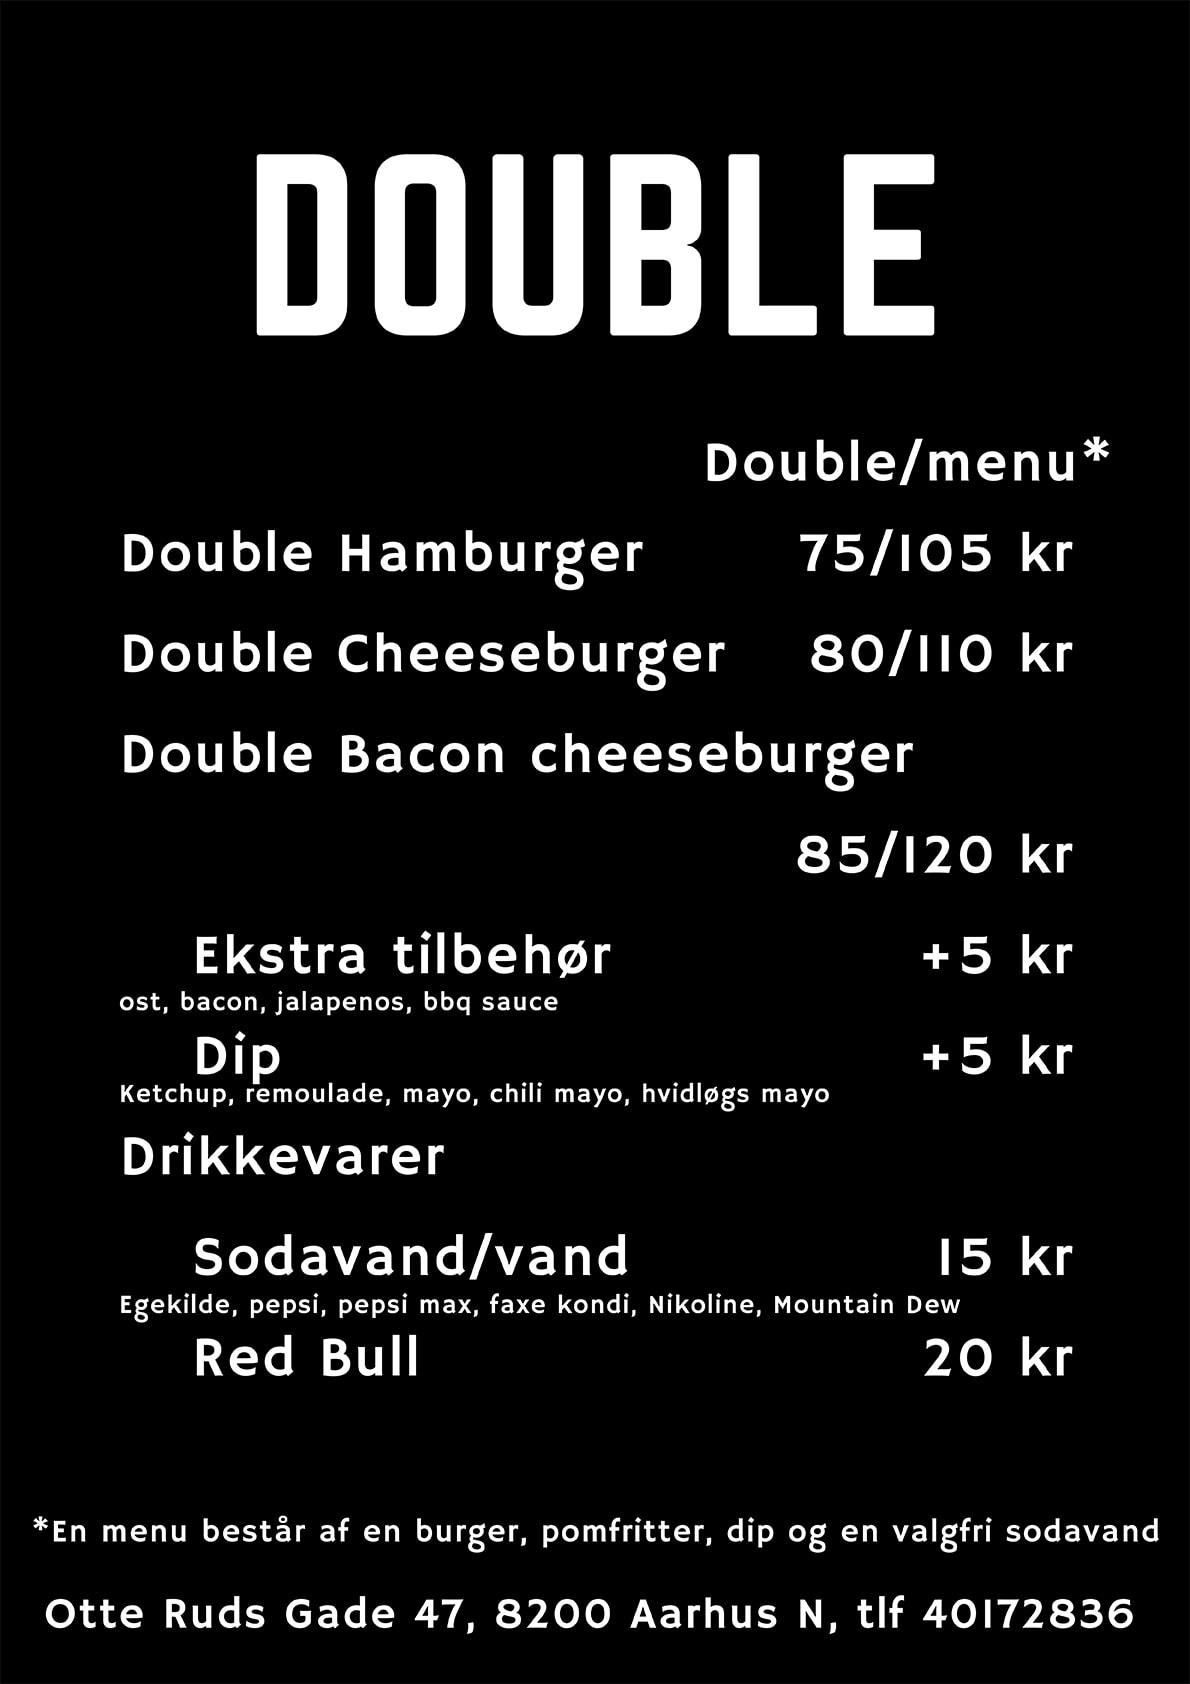 Dobbelt Burger Menu- Kødstadens Burger Joint - Trøjborg - Aarhus